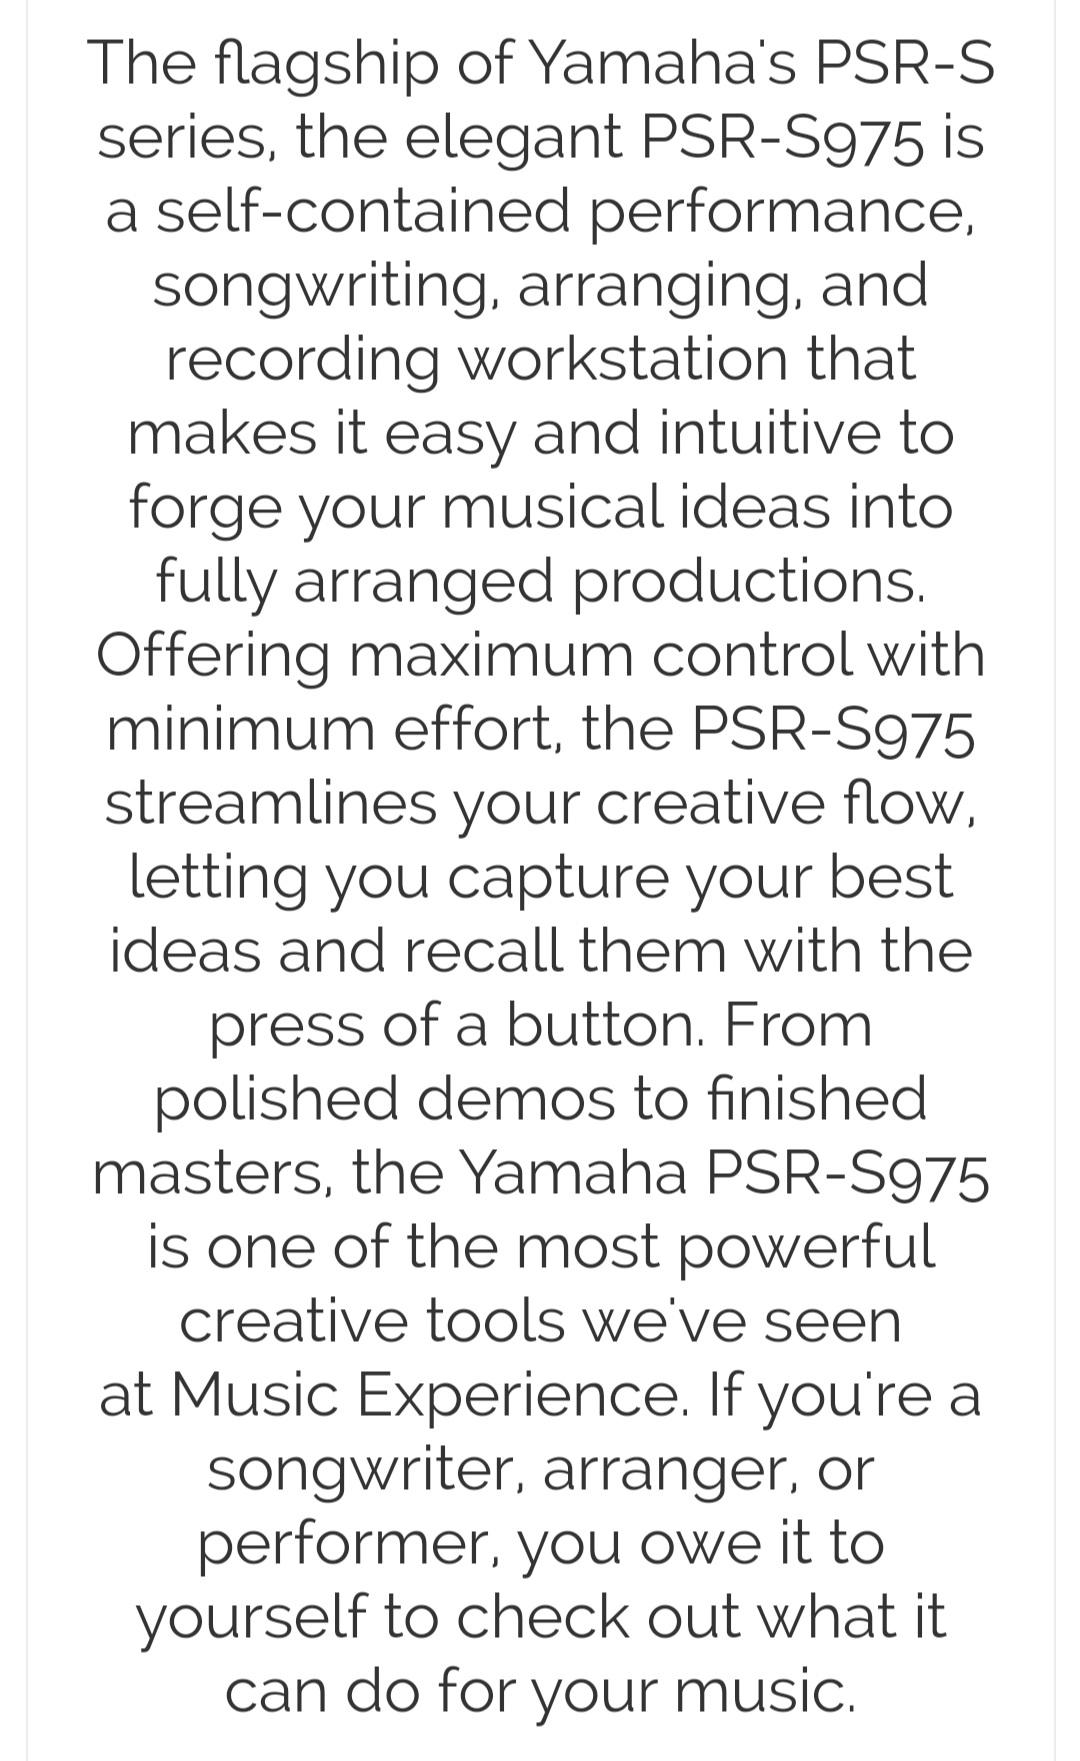 YAMAHA PSR-S975 Professional 61-key  Arranger Keyboard The Flagship of PSR-S ser